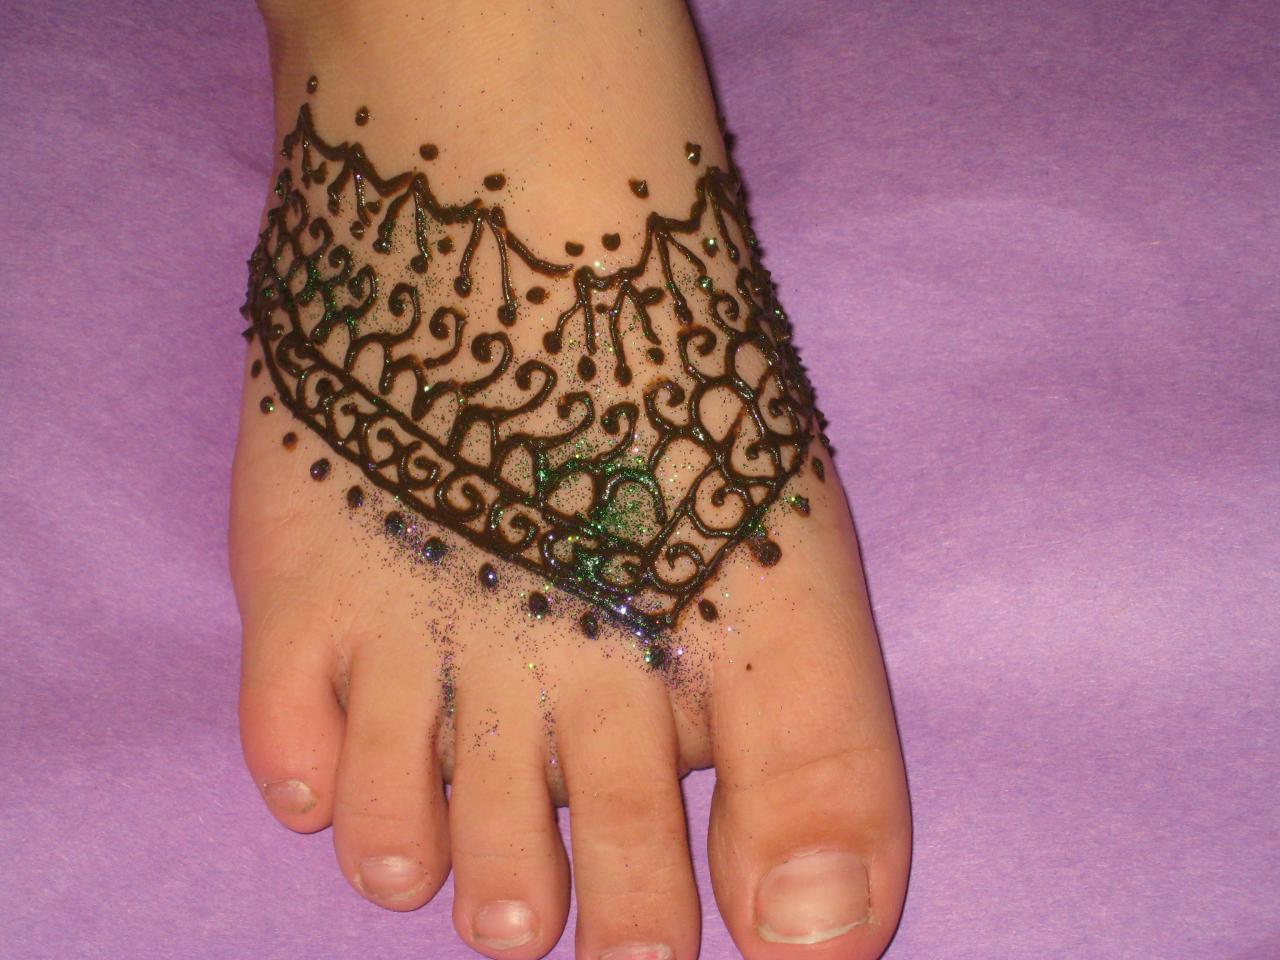 Elephant footprints tattoo - photo#3